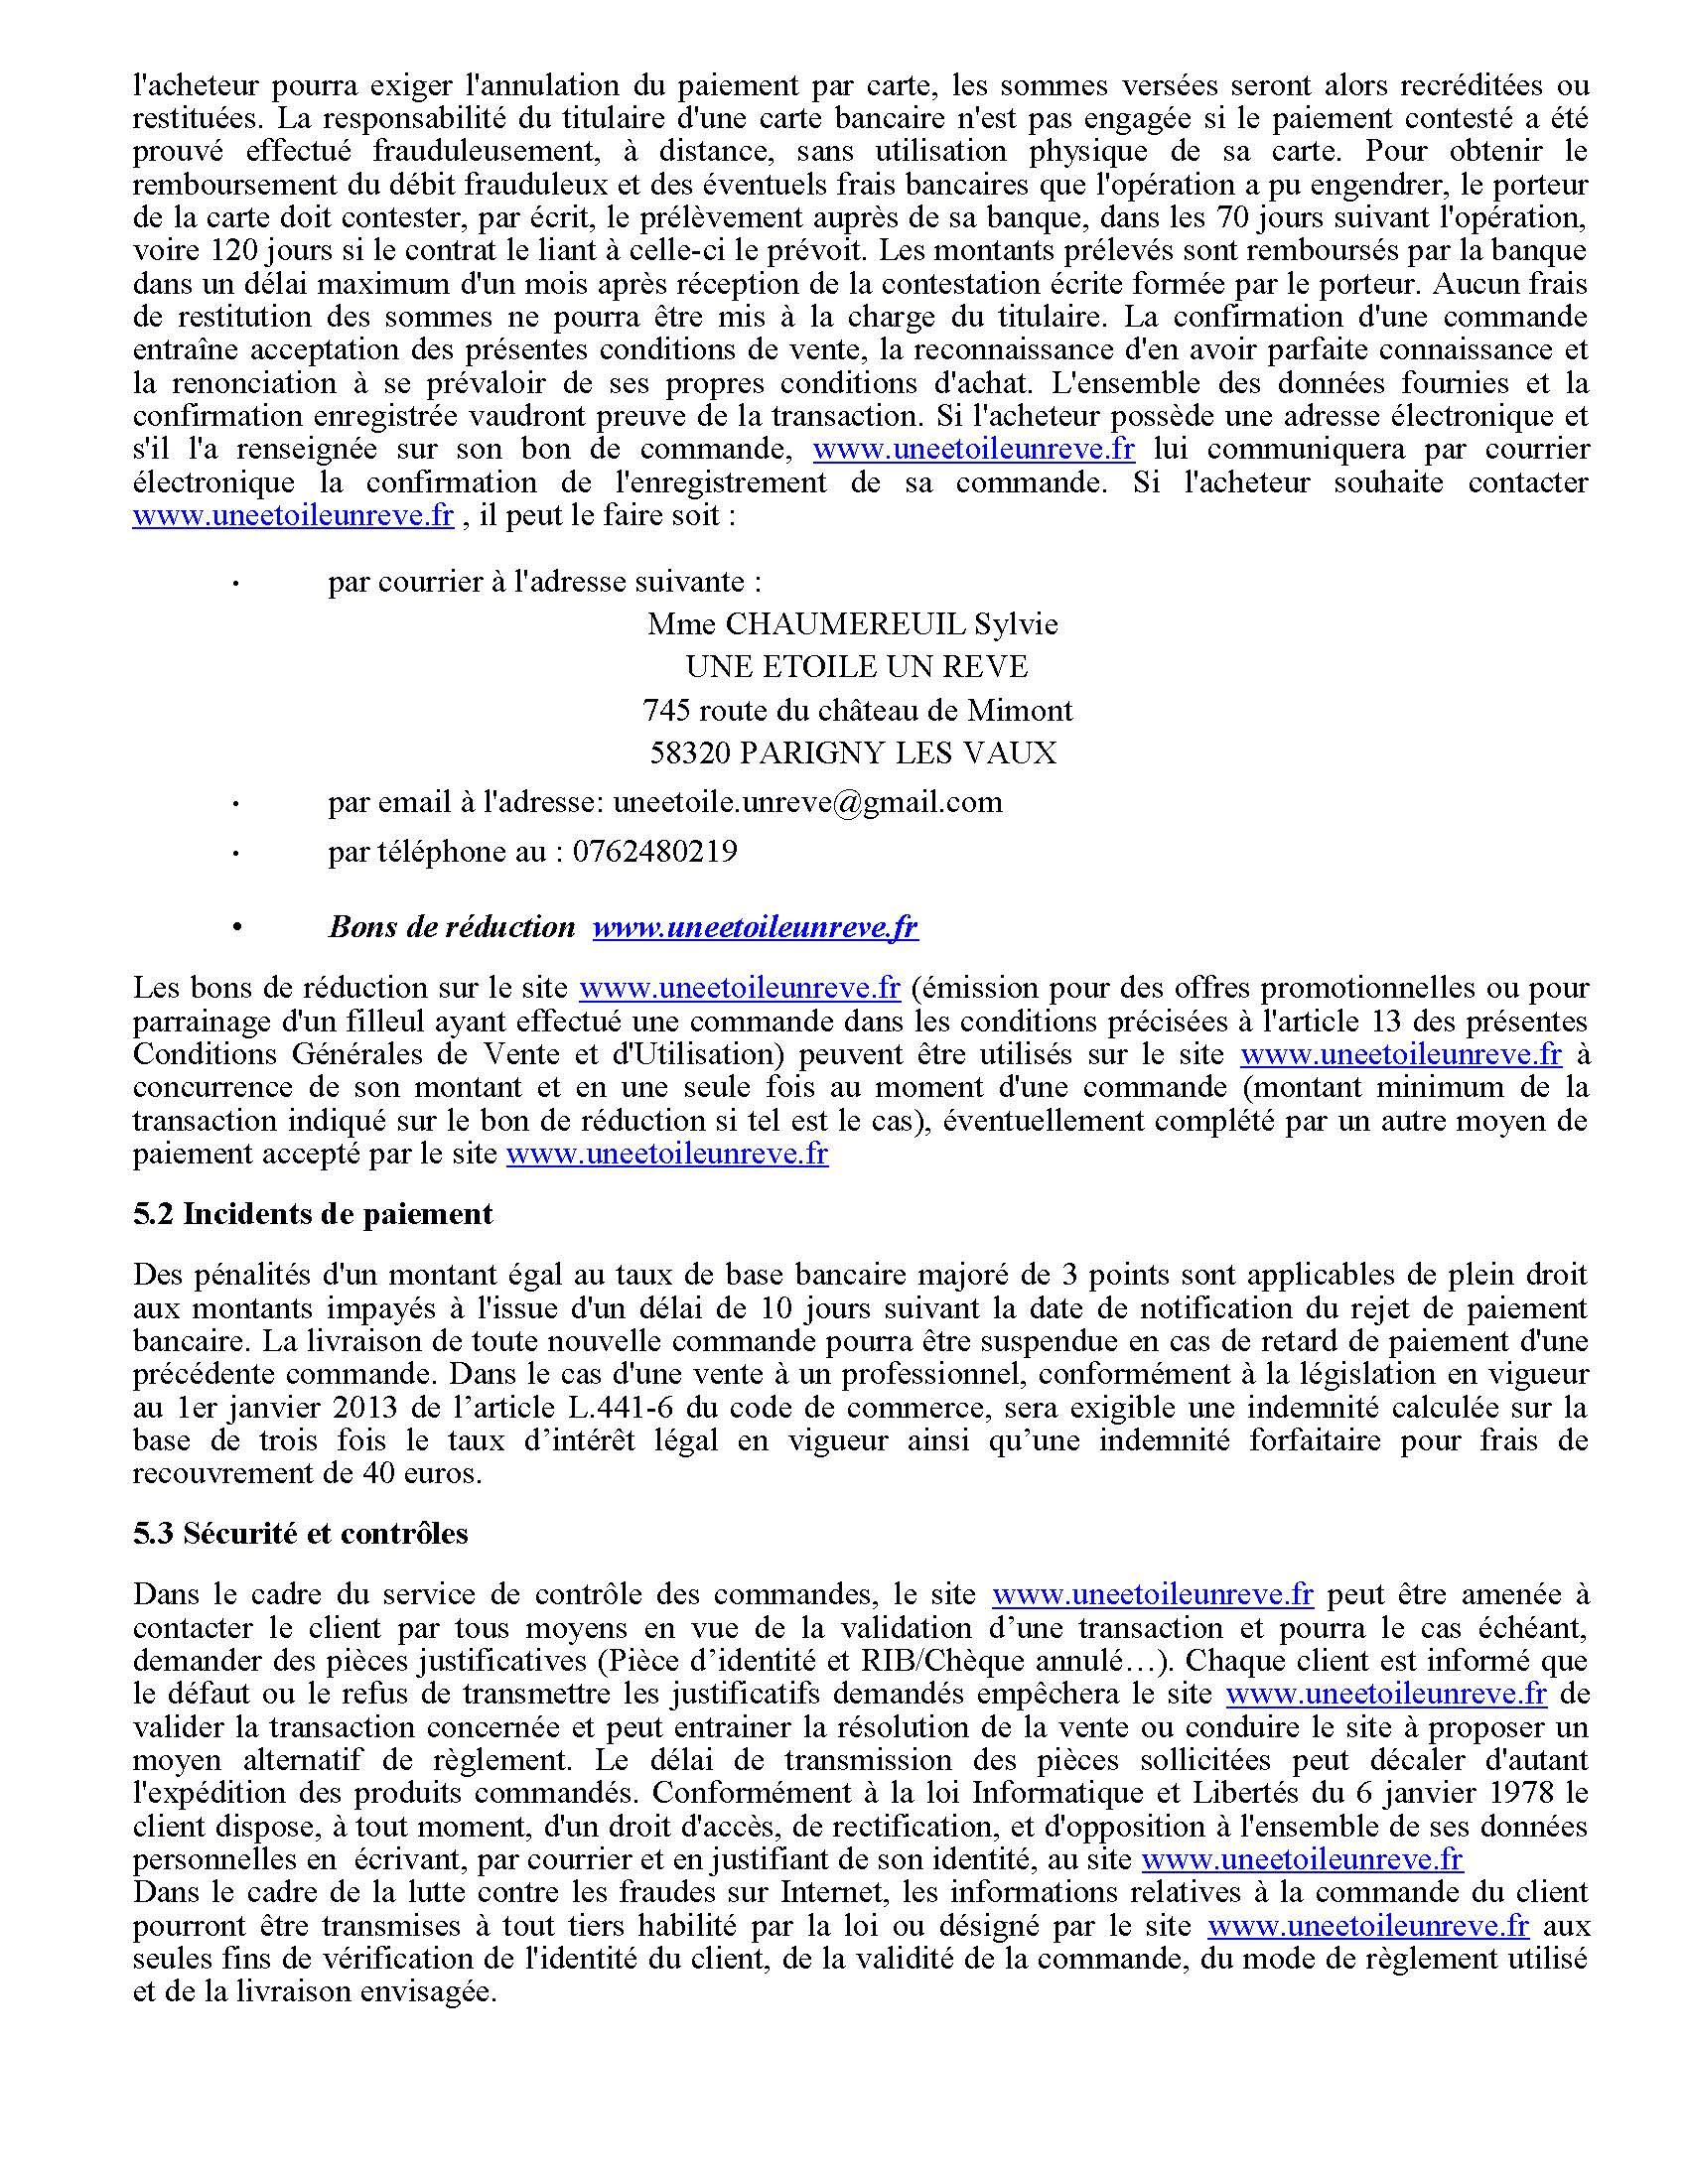 CGV_www.uneetoileunreve.fr_Page_05.jpg